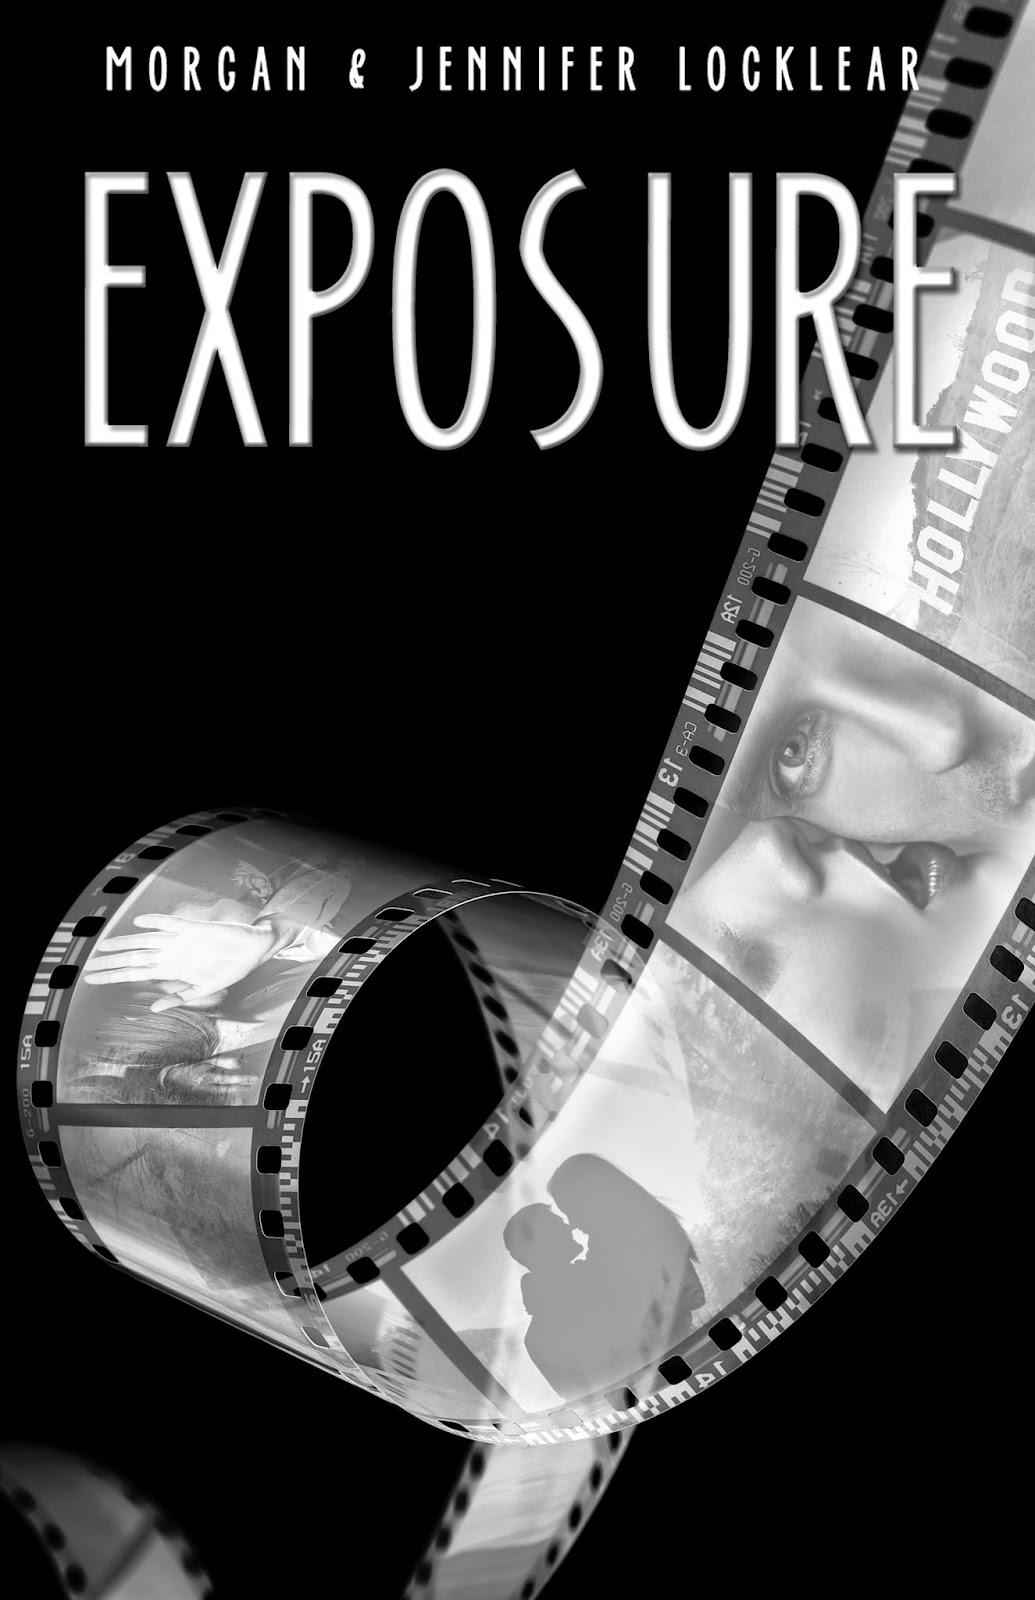 Exposure_Cover_FINAL.jpg